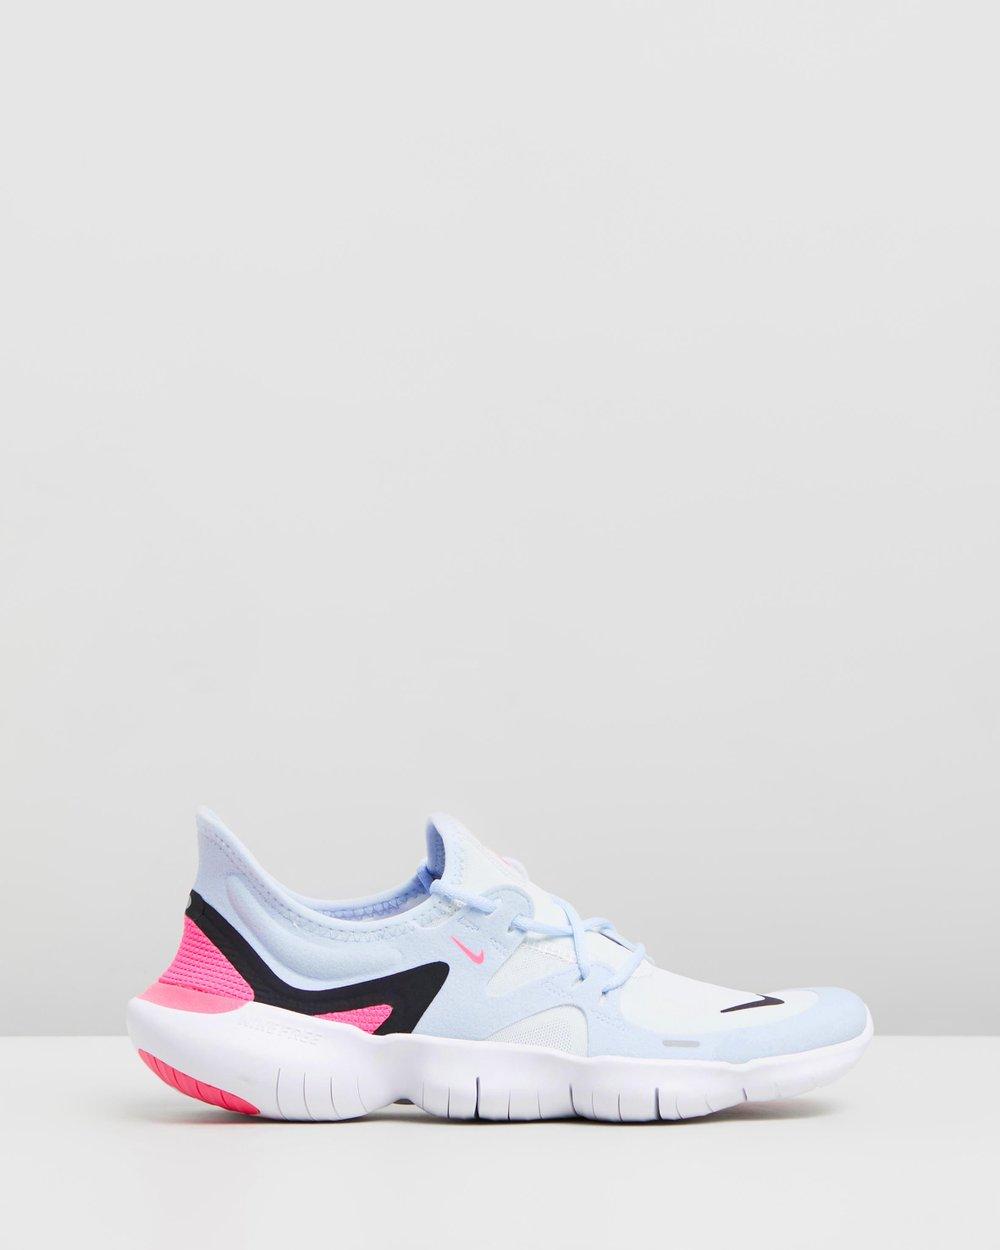 get cheap 3470b 88508 Free Run 5.0 - Women s by Nike Online   THE ICONIC   Australia